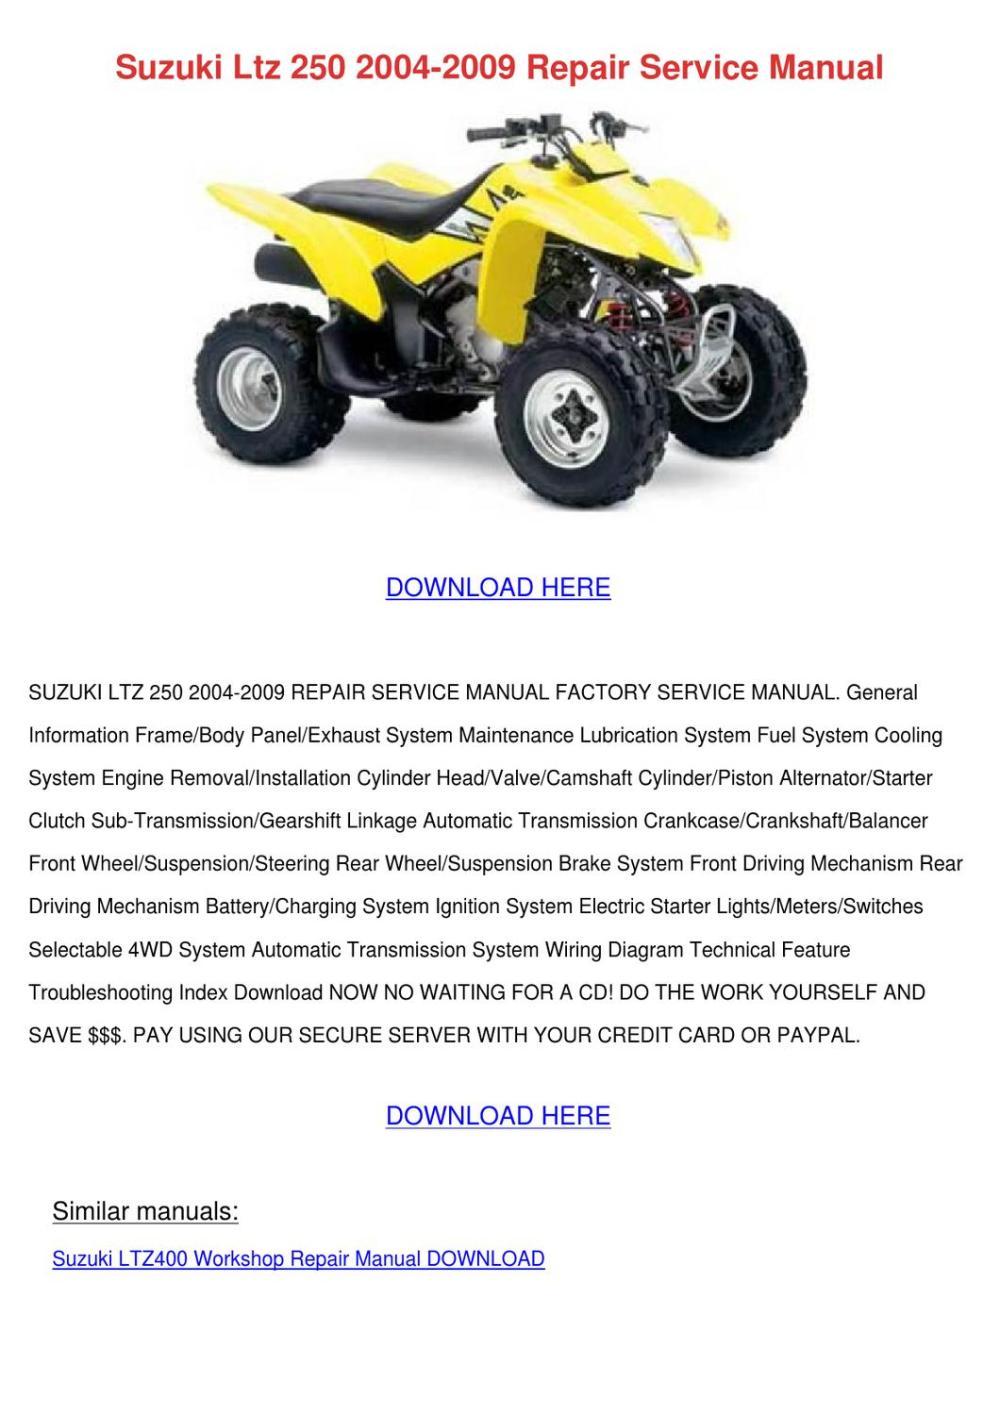 medium resolution of suzuki ltz 250 2004 2009 repair service manua